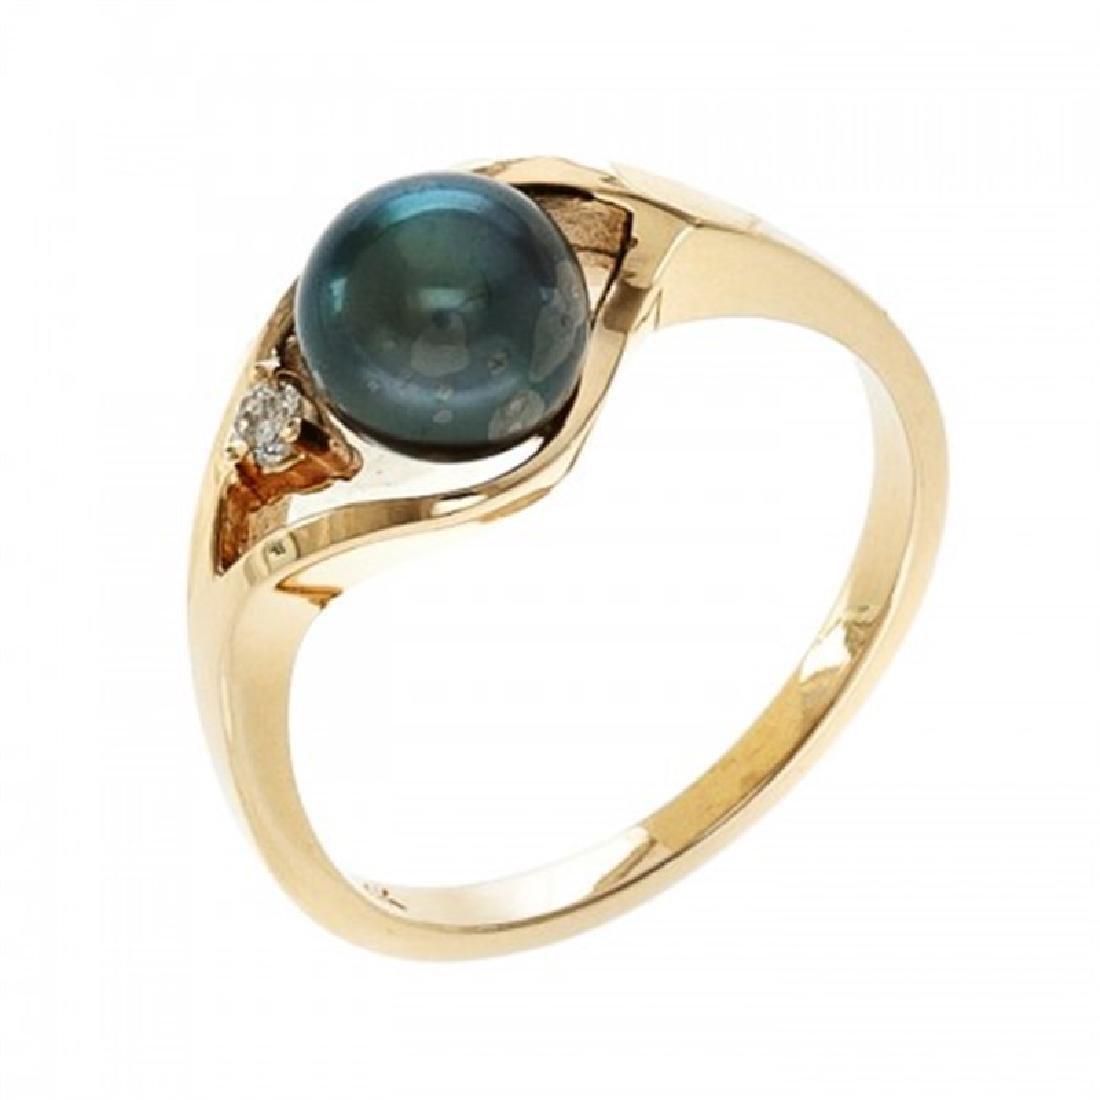 6.5-7.0mm Japanese Akoya Pearl Ring with Diamond